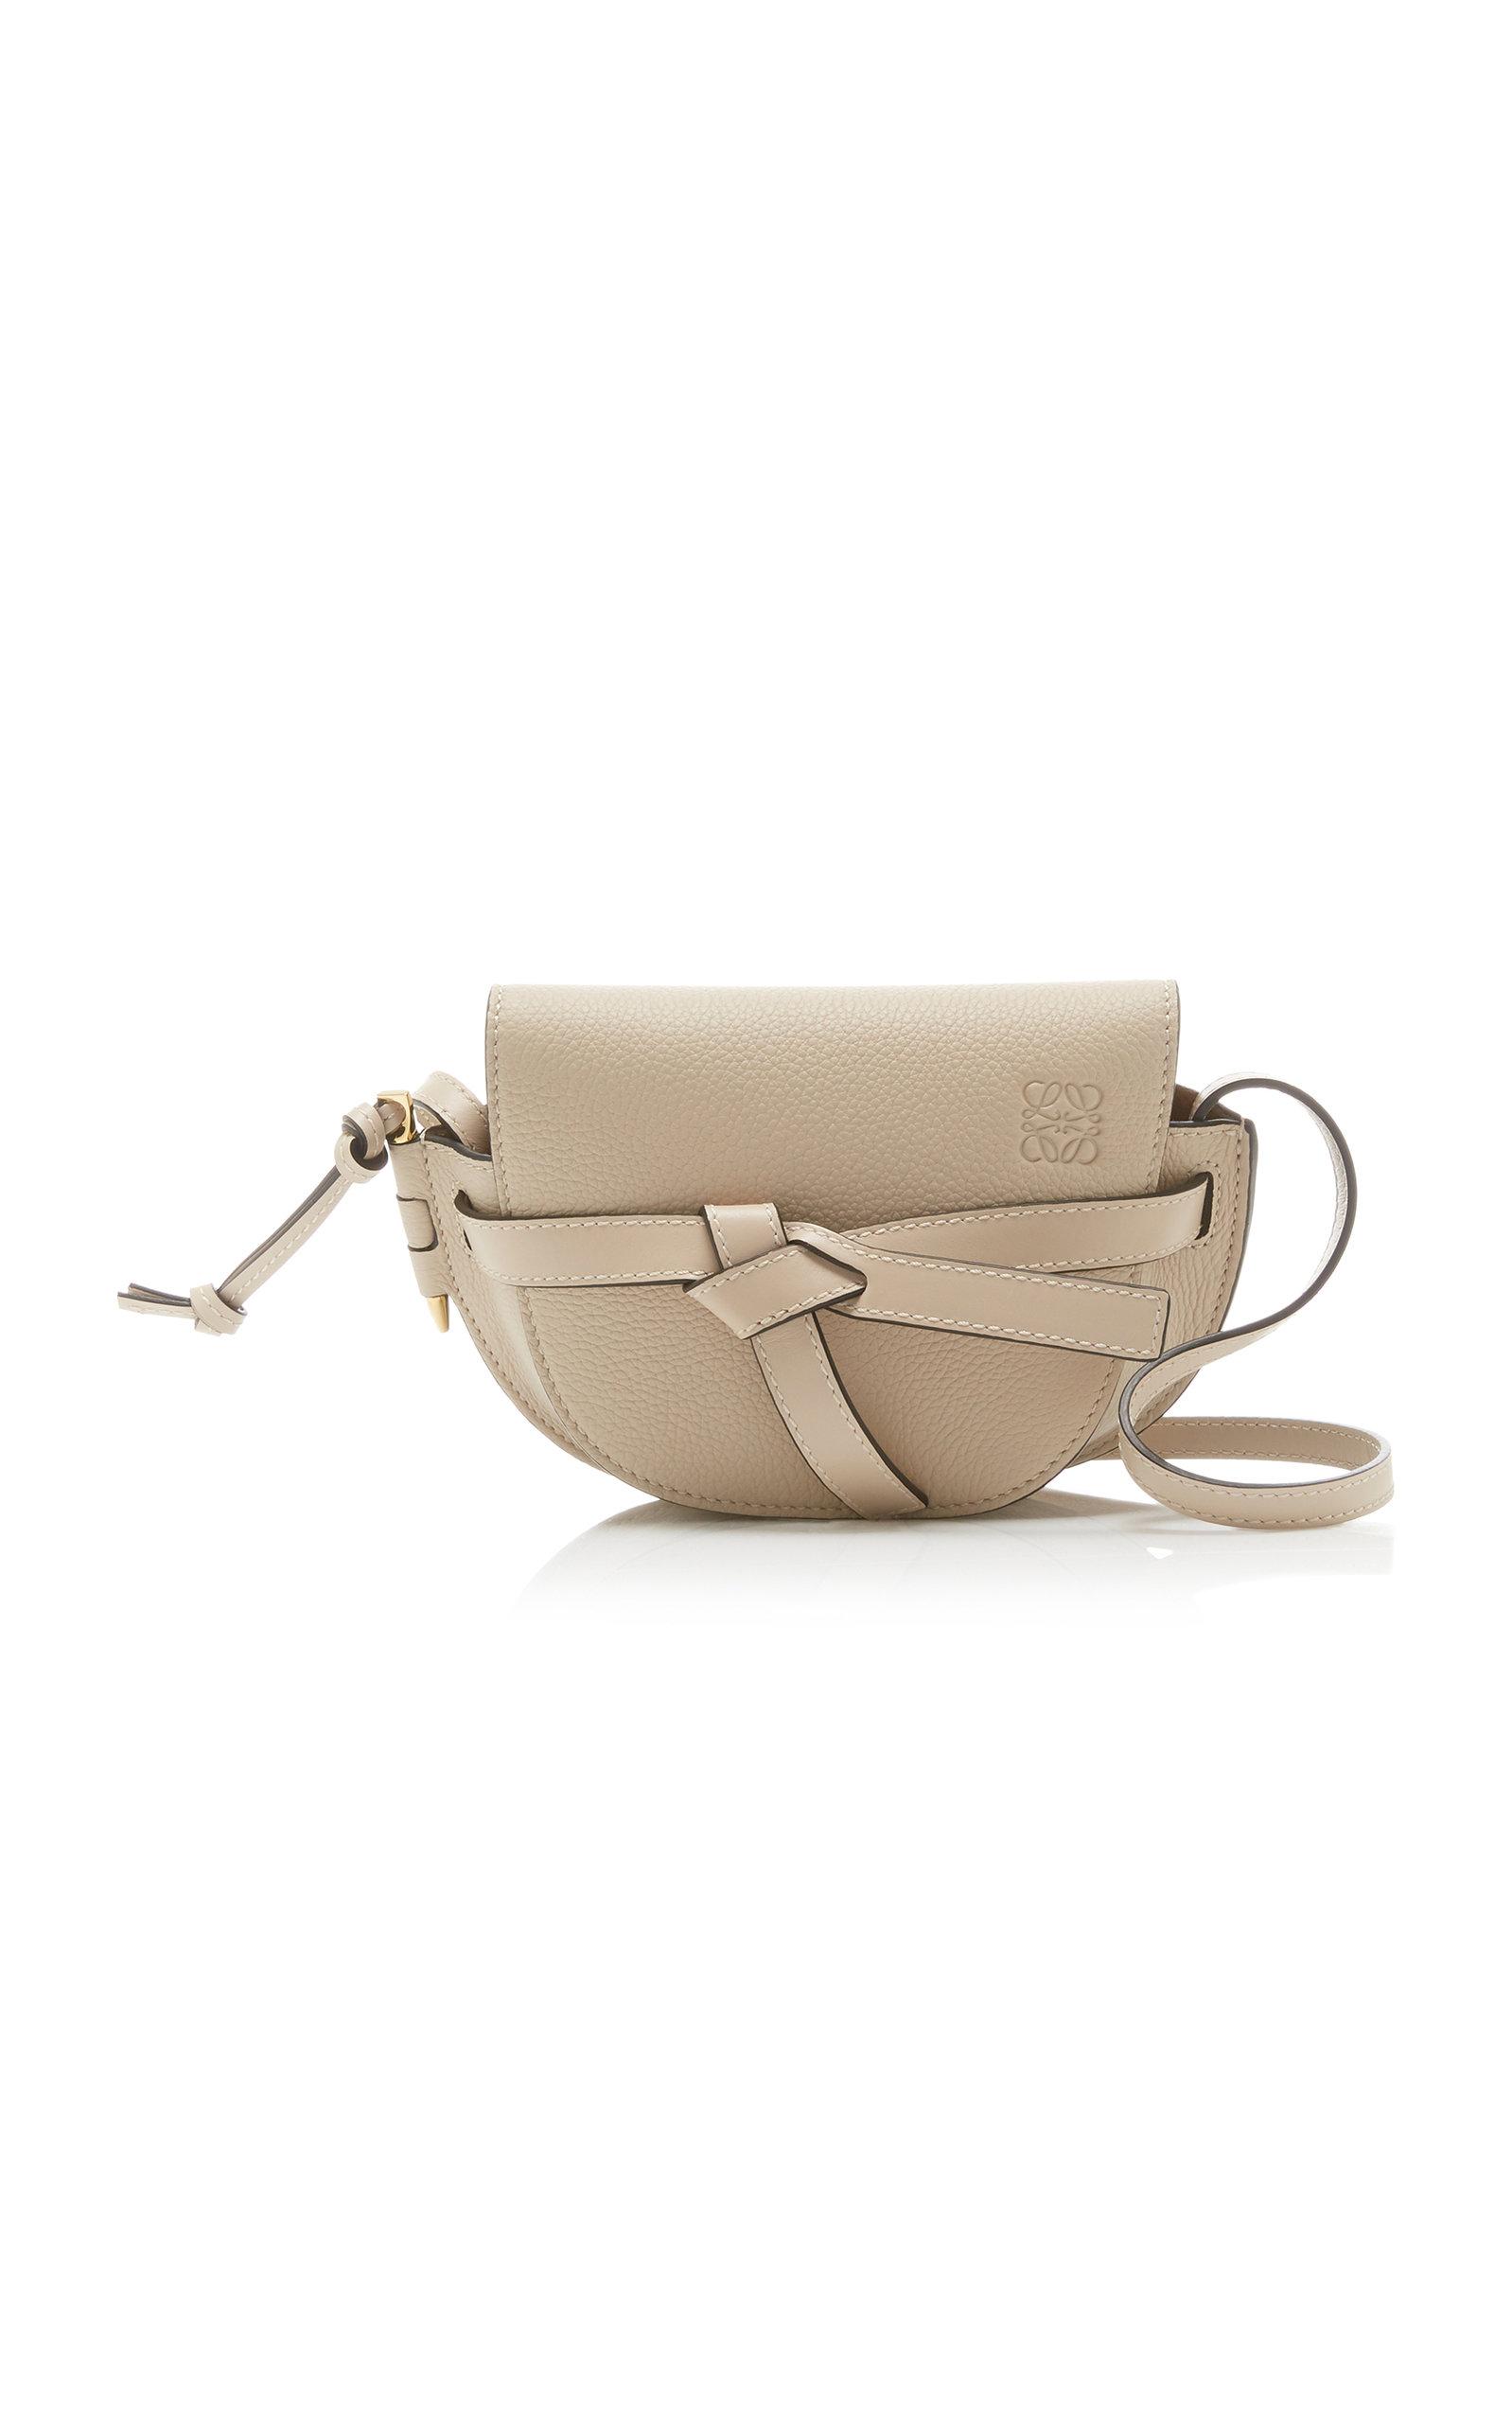 8c37eff97 Gate Mini Leather Shoulder Bag. $1,350 ( Deposit). + More Colors. Loewe